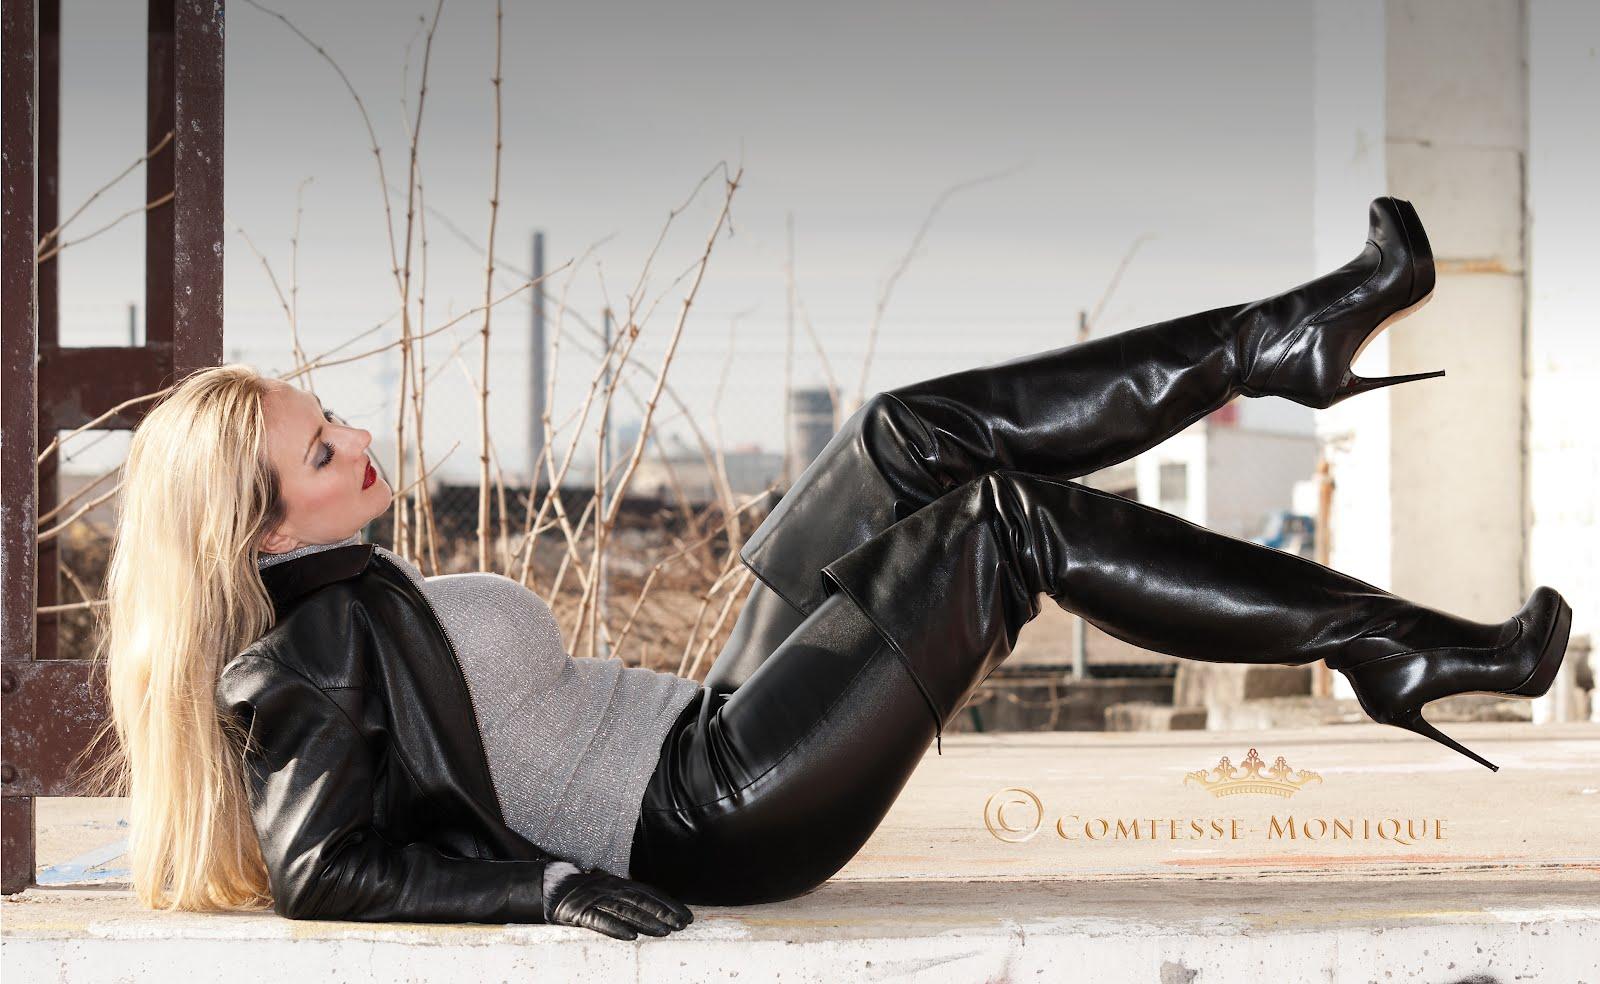 Leather Leather Leather Blog Comtesse Monique Leather 8 Uhq